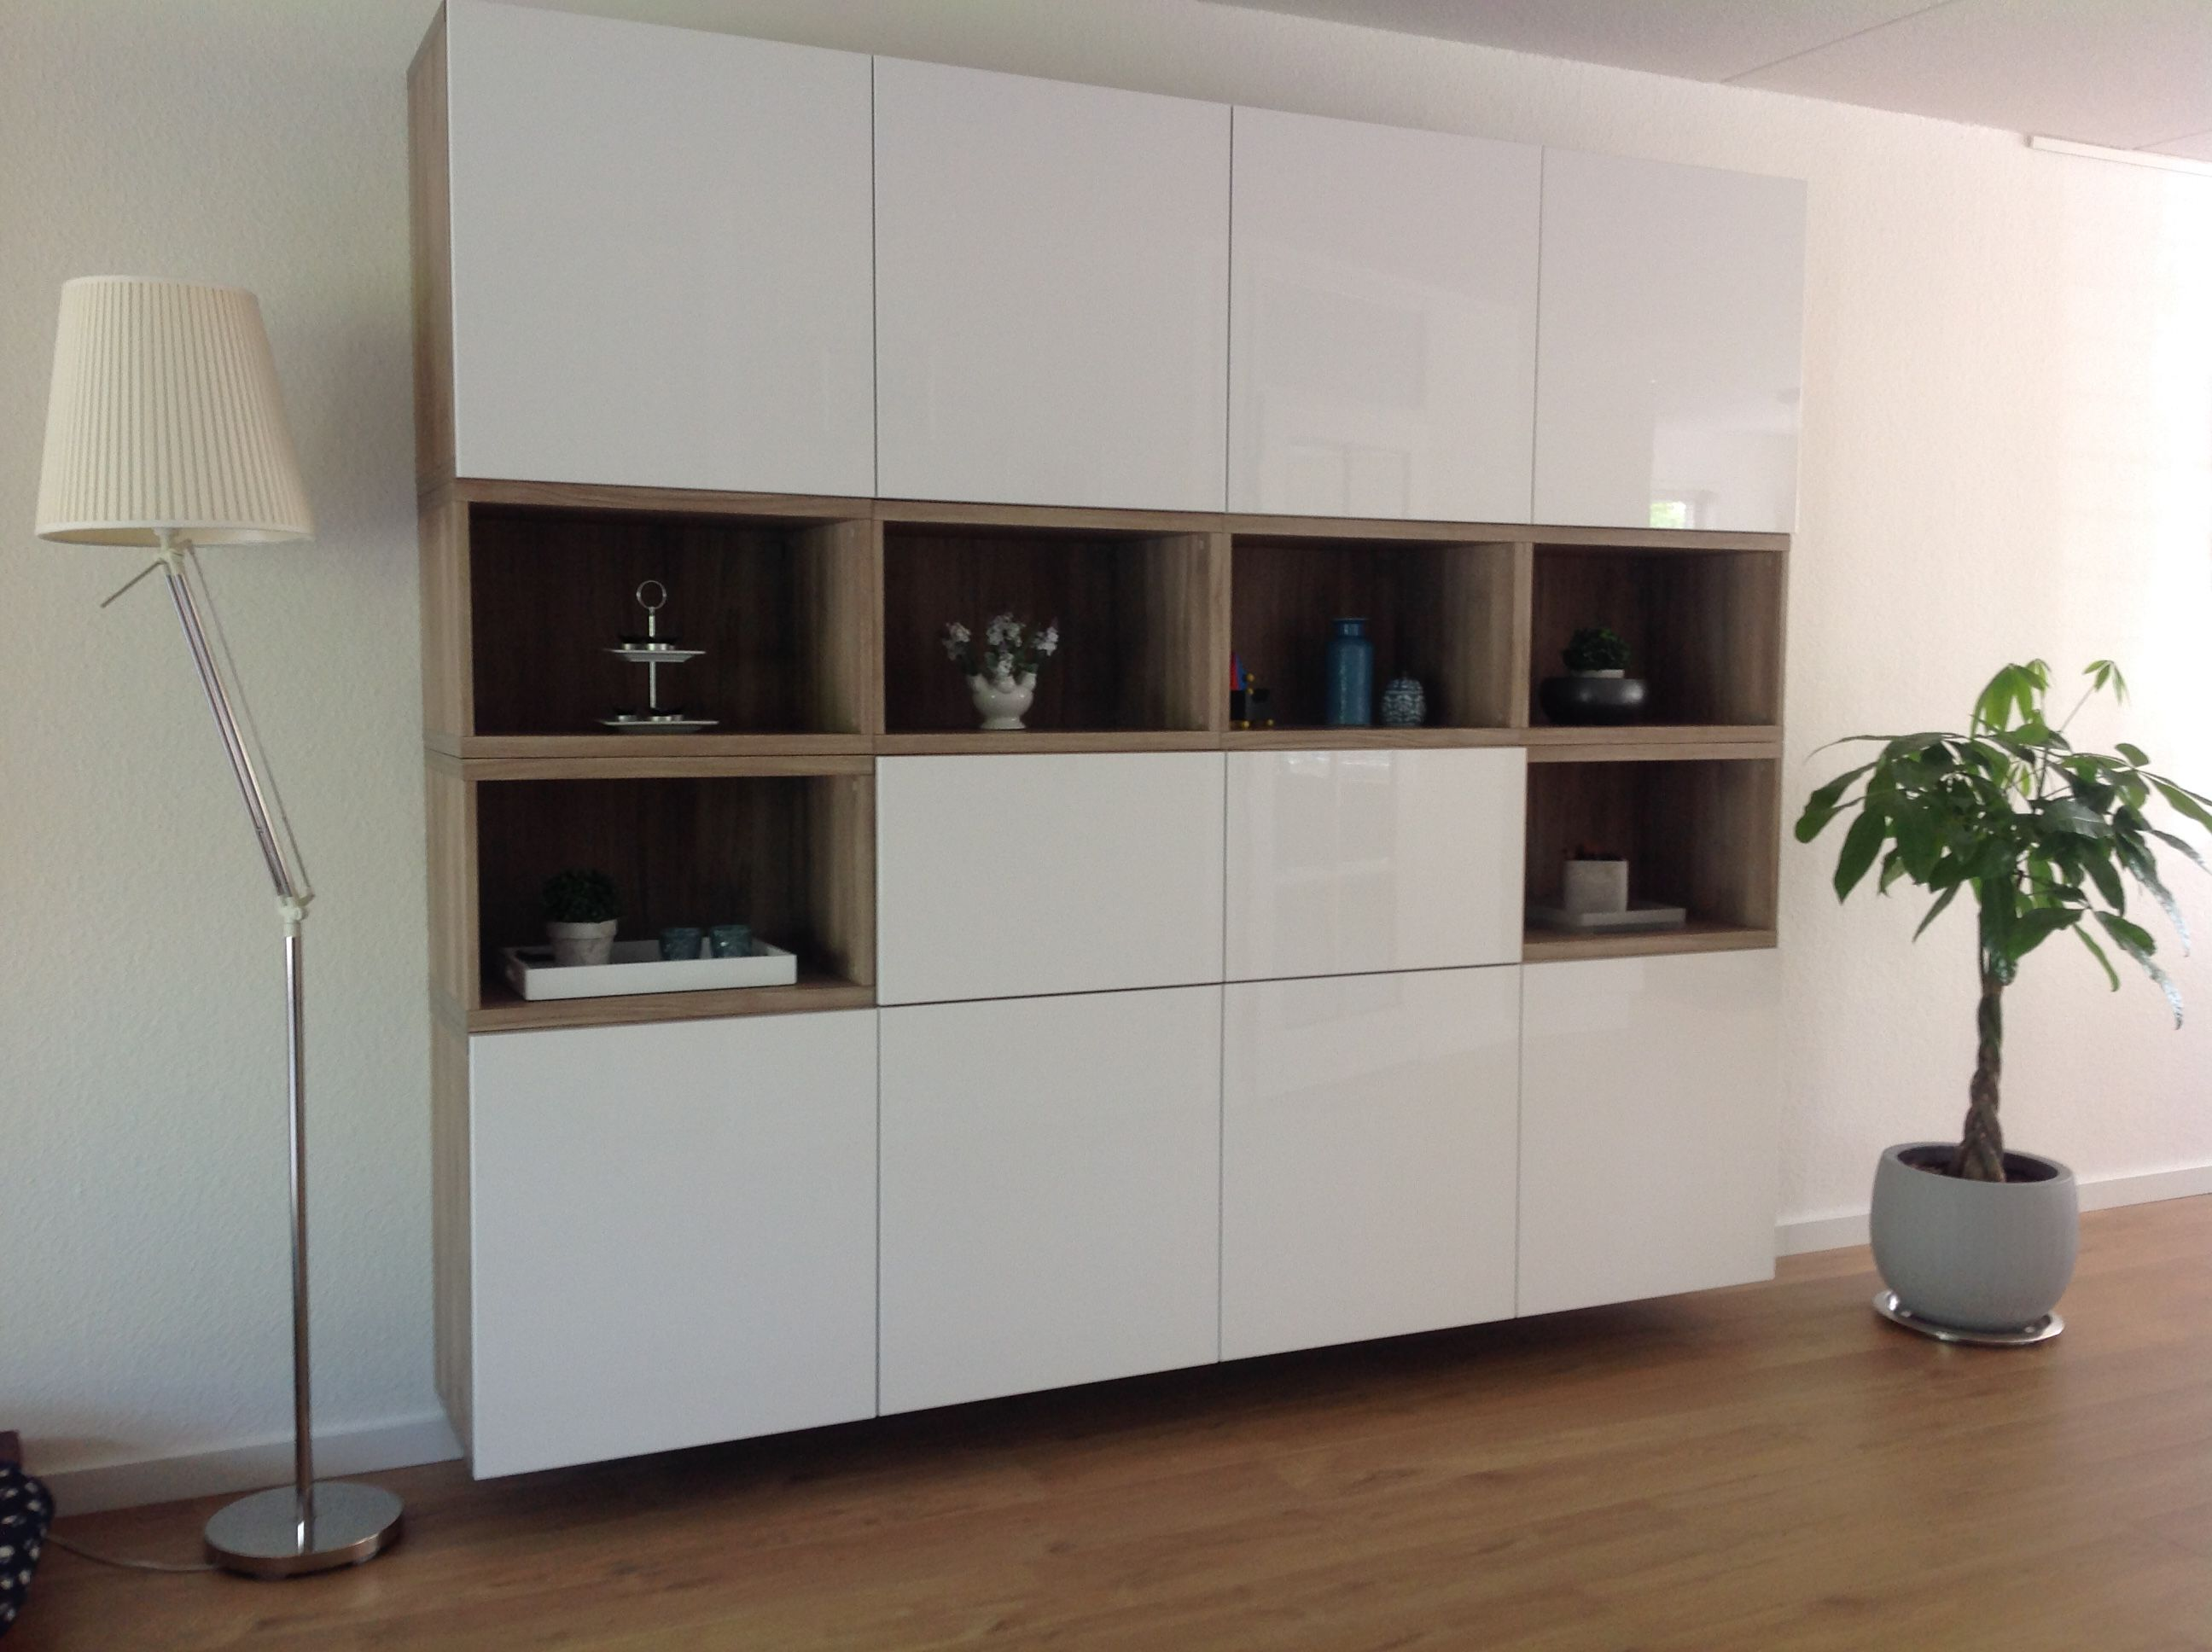 Ikea Besta Wohnwand Pinterest